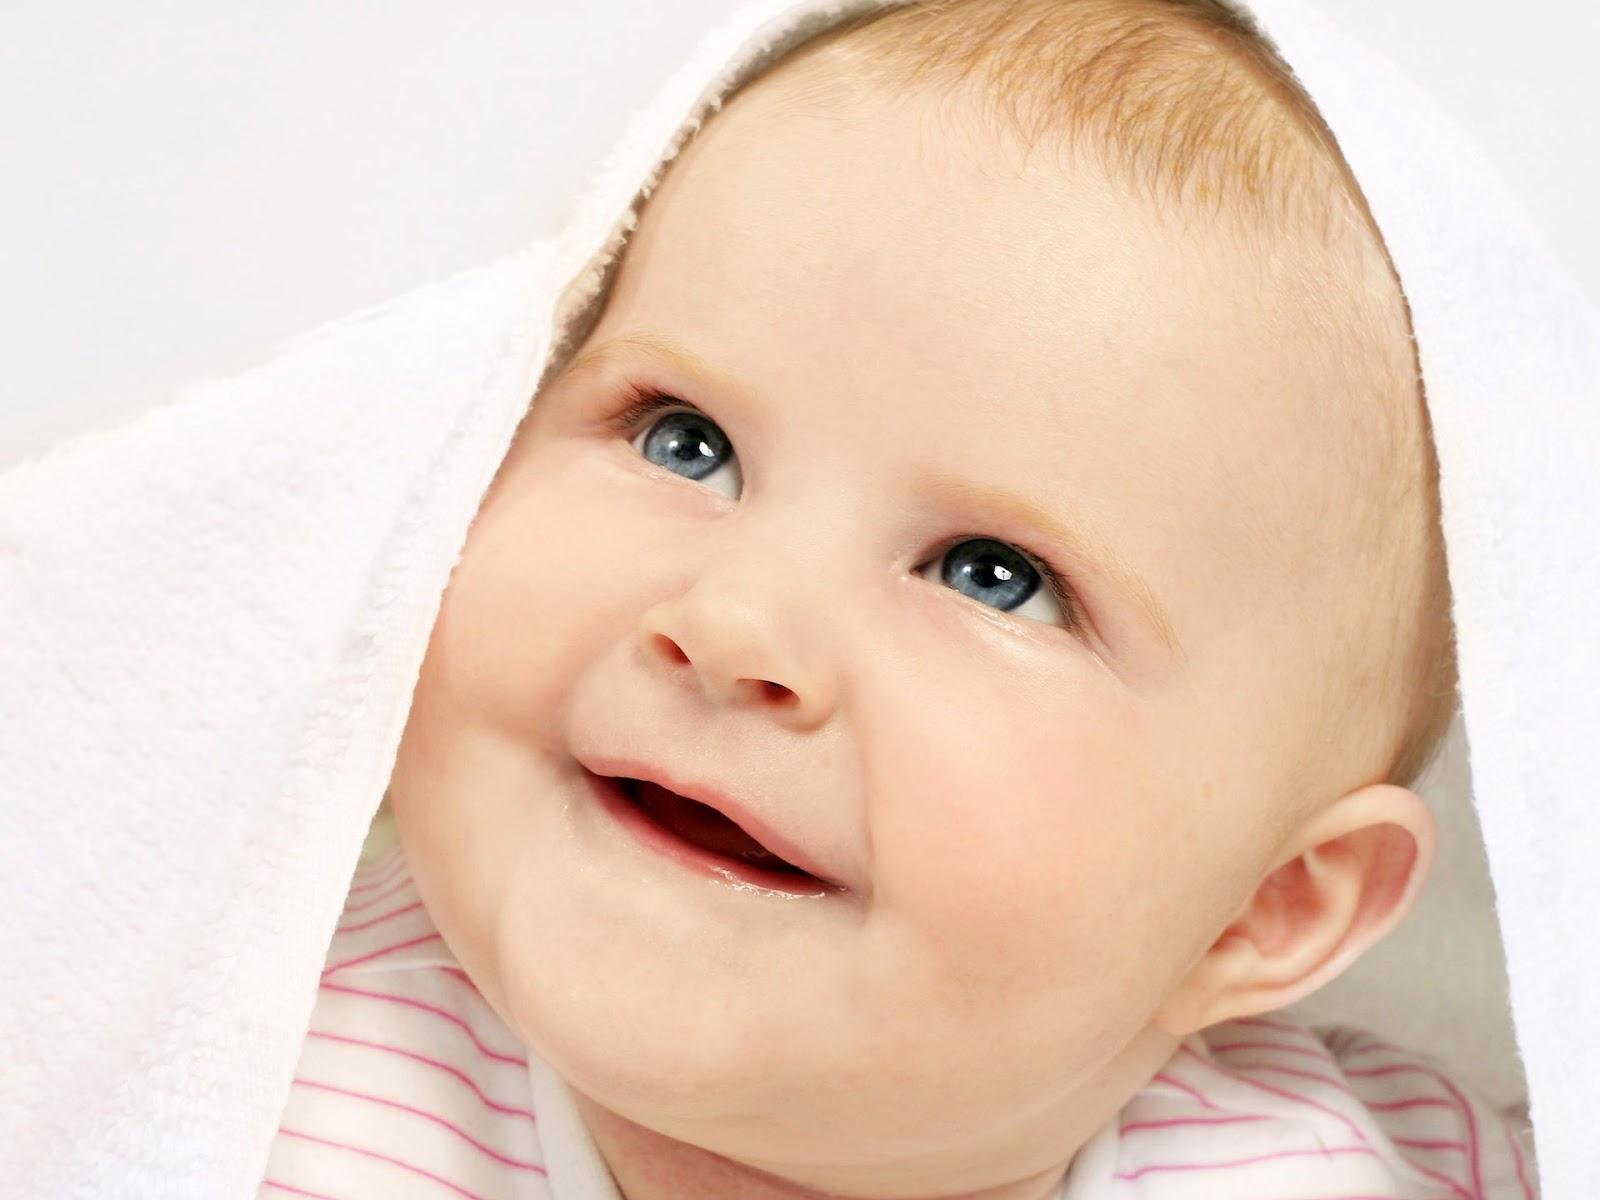 http://2.bp.blogspot.com/-XALxh3Fzo50/T1Kj4tCc9gI/AAAAAAAAASo/CrBeCAtsZTo/s1600/cute-baby-wallpaper-7.jpg